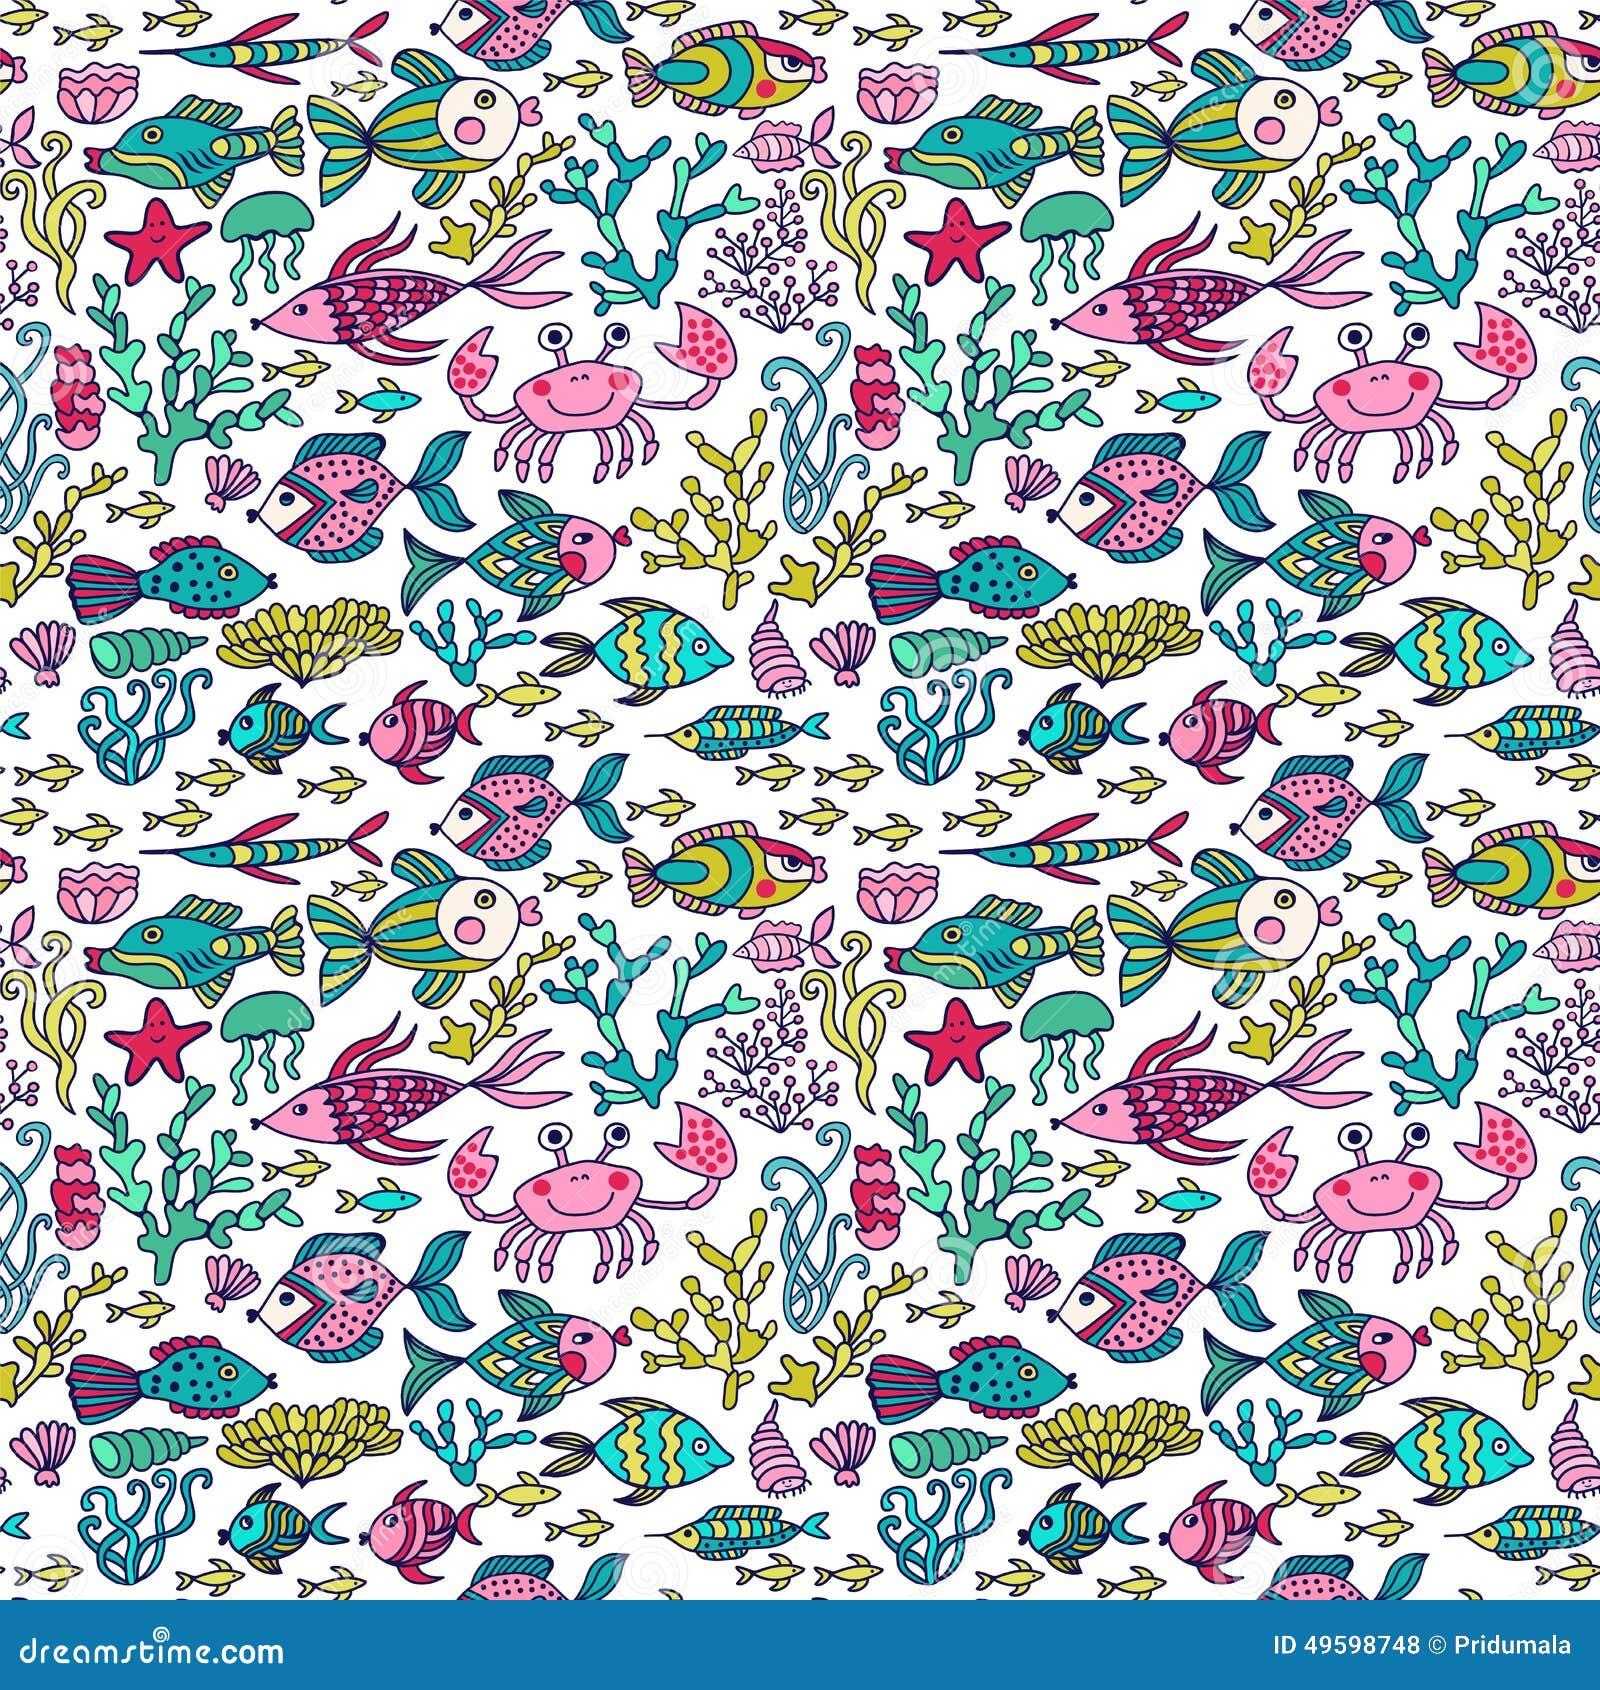 ocean fish wallpaper pattern - photo #17